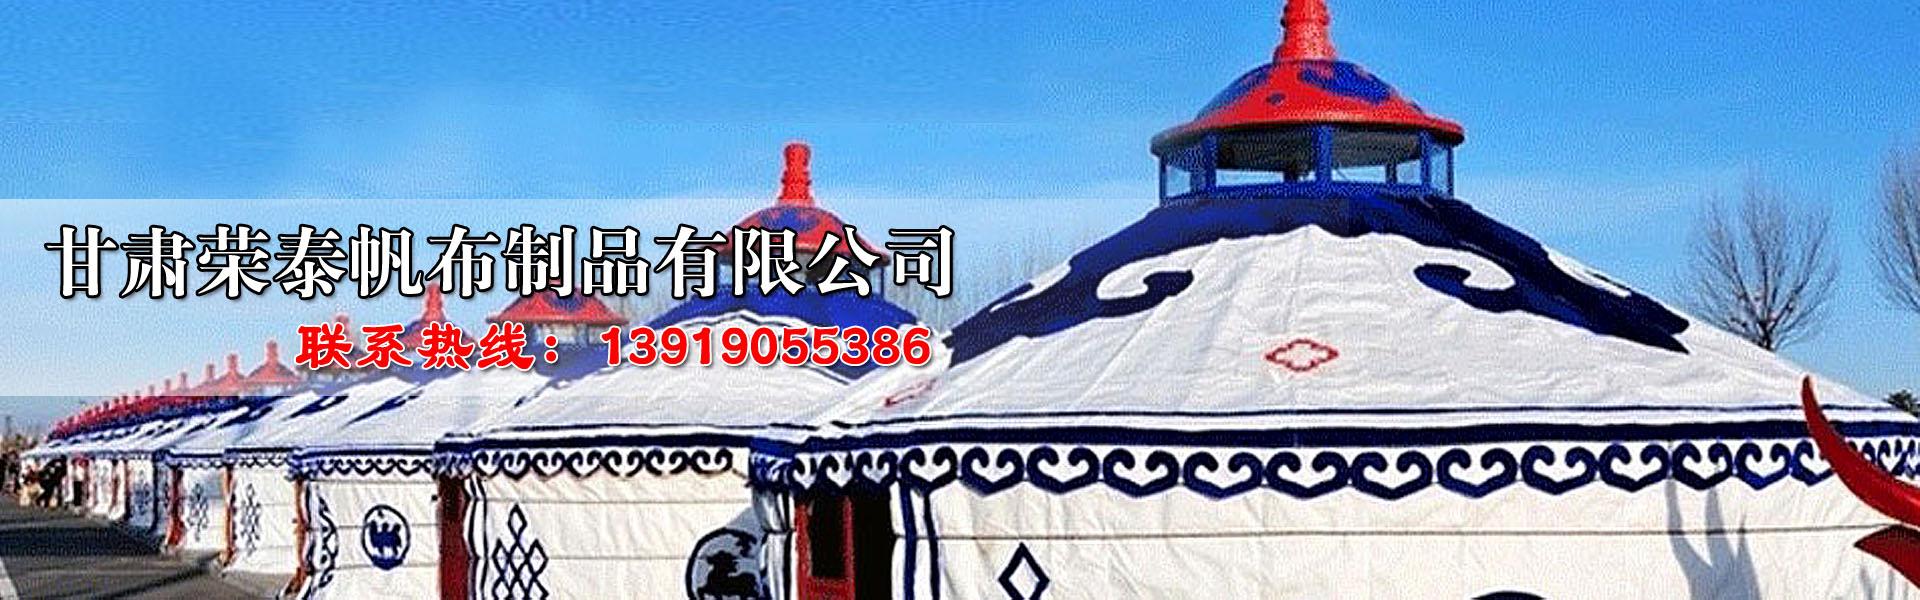 甘肅榮泰帆布制品bobapp下载安装